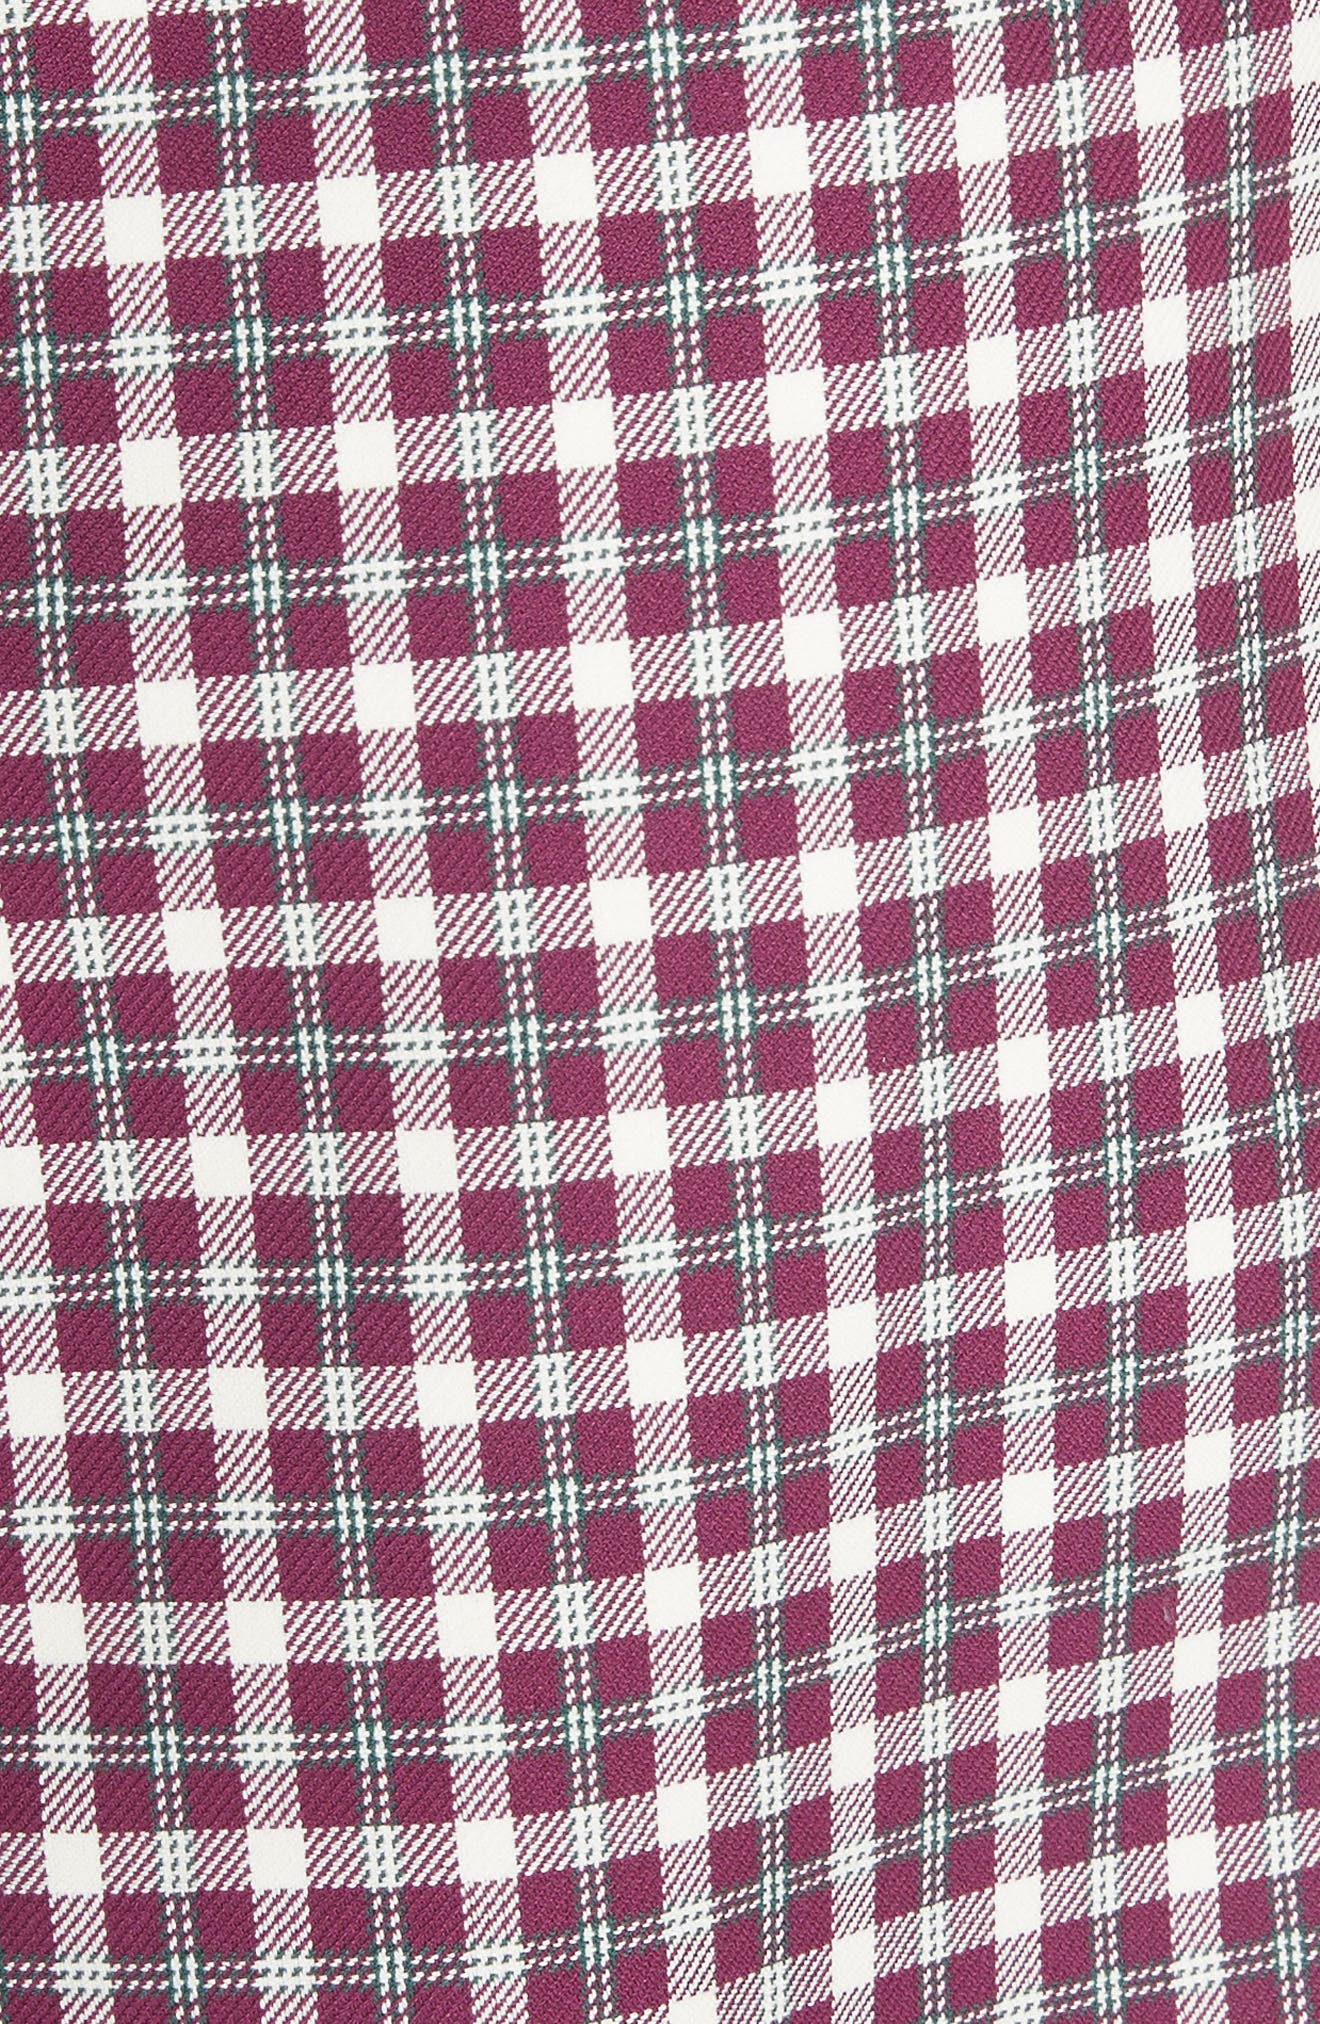 Stanforth Plaid A-Line Skirt,                             Alternate thumbnail 5, color,                             931